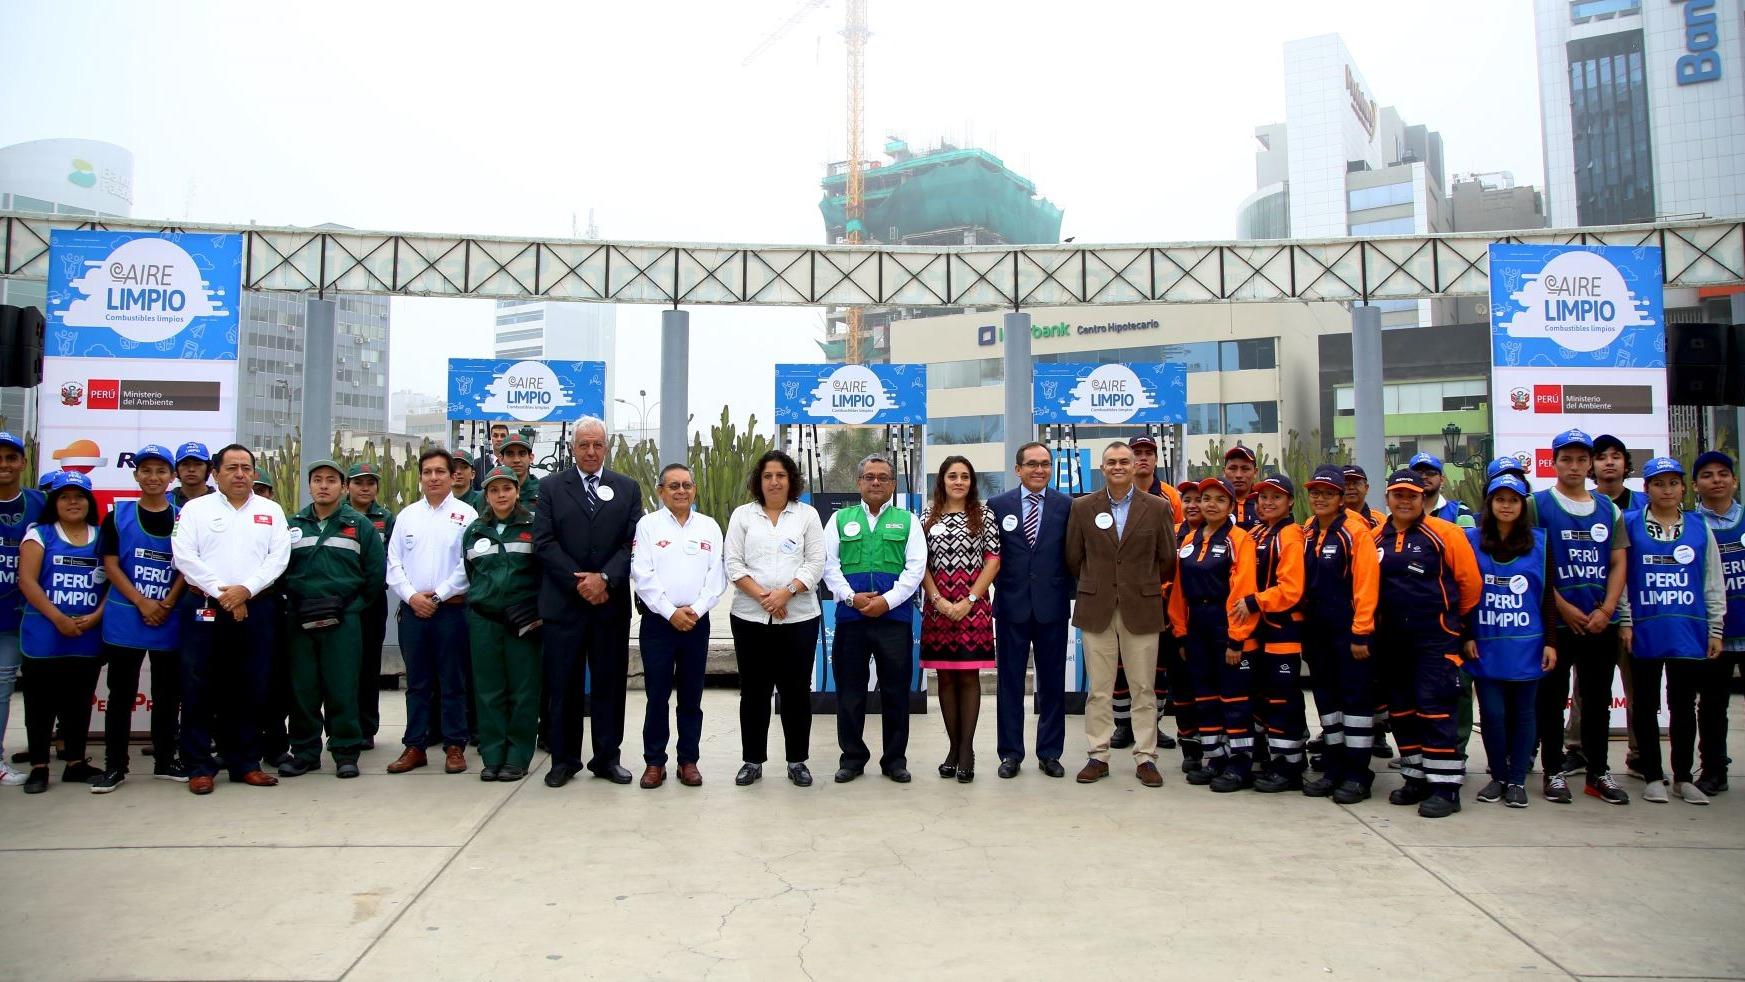 Fabiola Muñoz, representante de esta cartera, indicó a RPP Noticias que a esta tarea se han sumado representantes de las empresas de combustible.